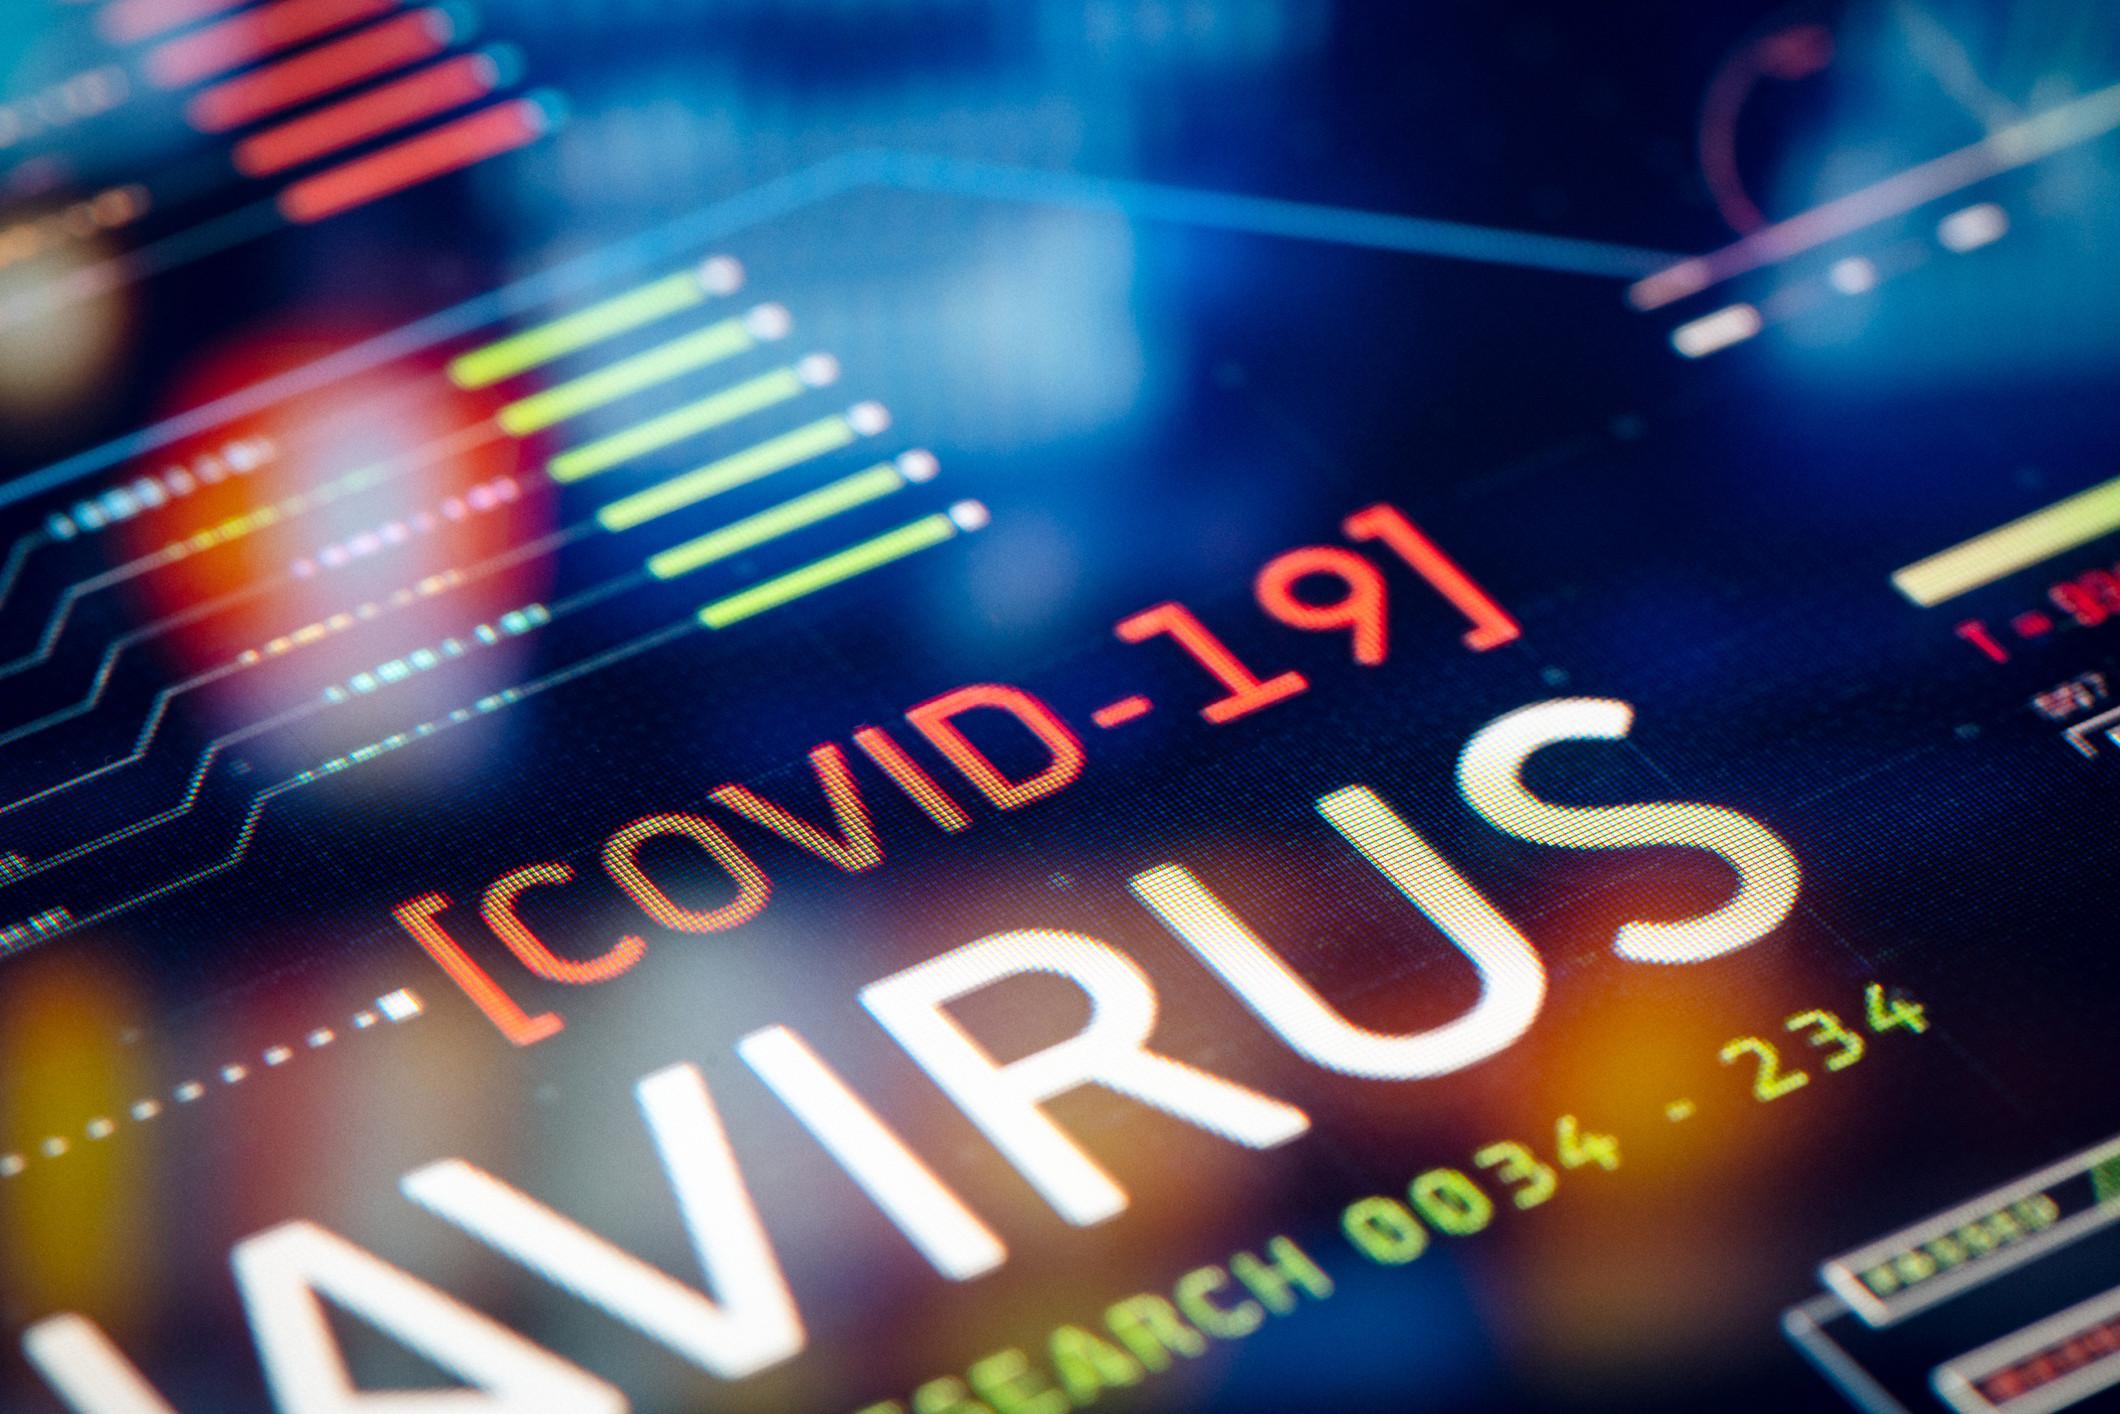 COVID-Tech: технологии против пандемии